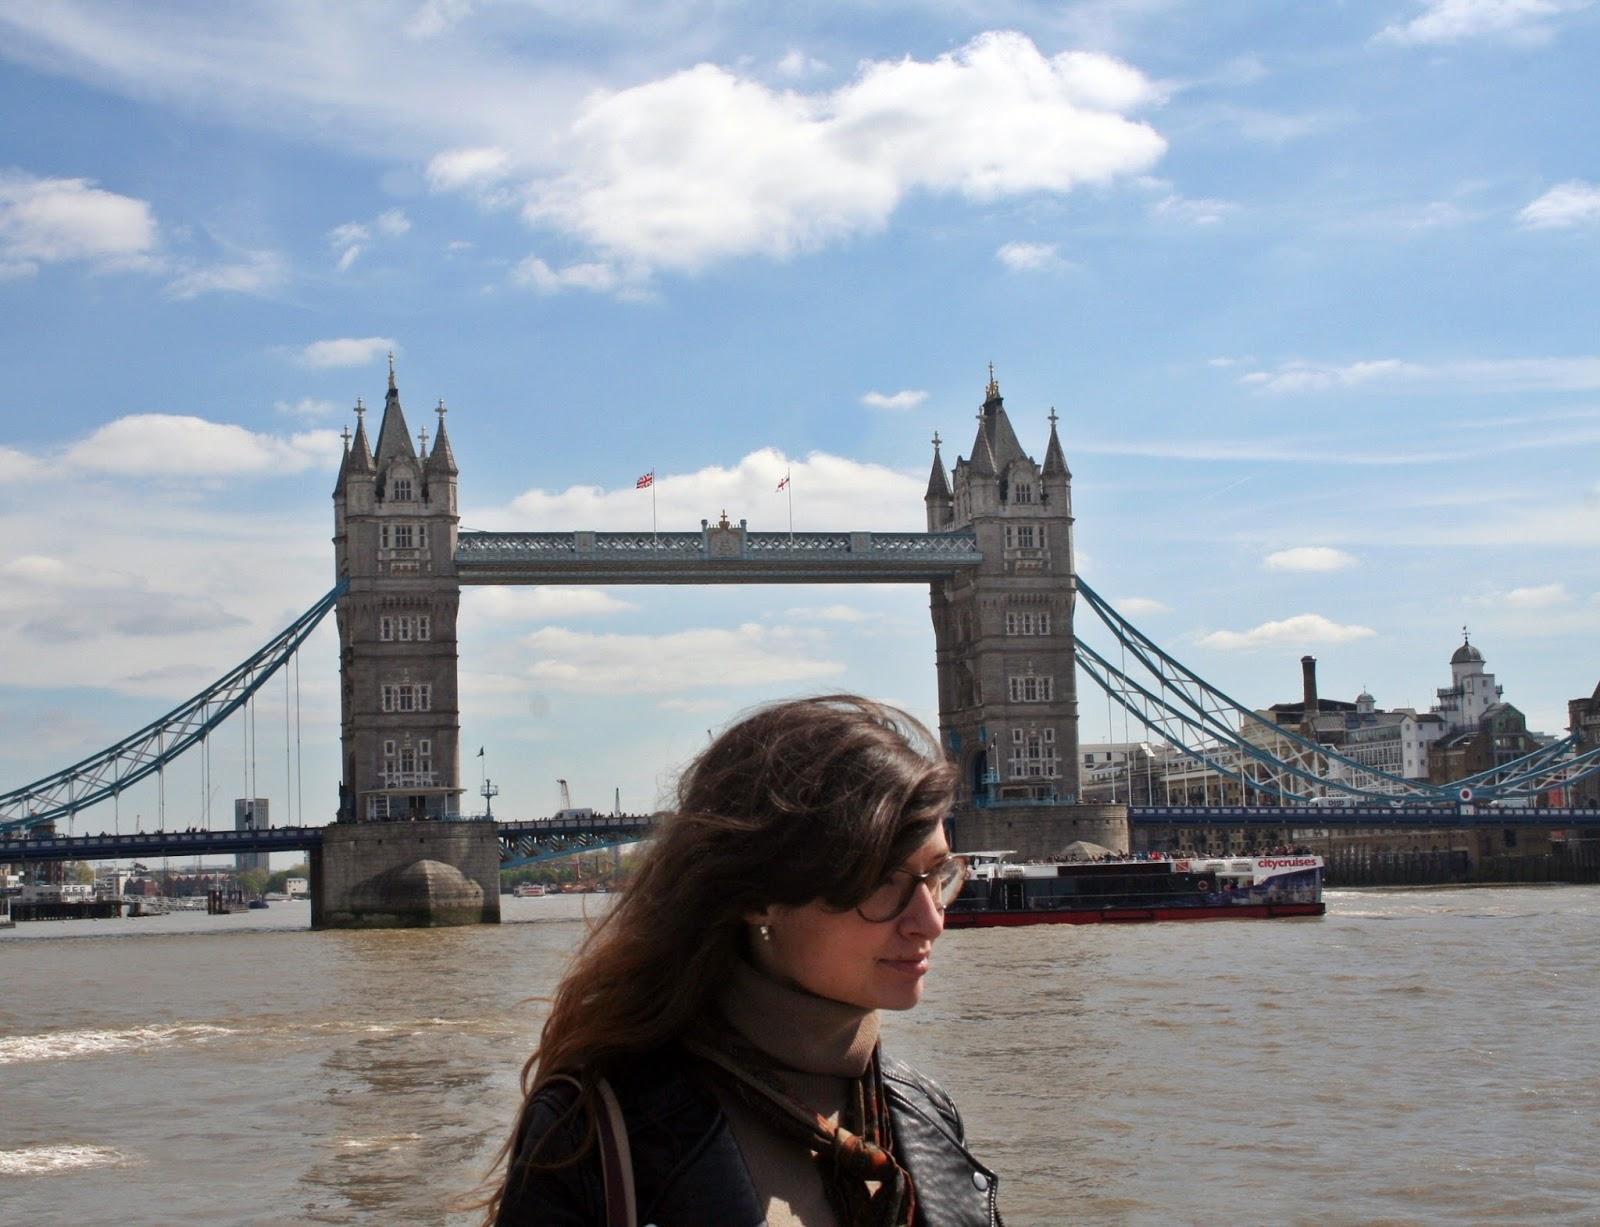 London Bridge - Tower of London